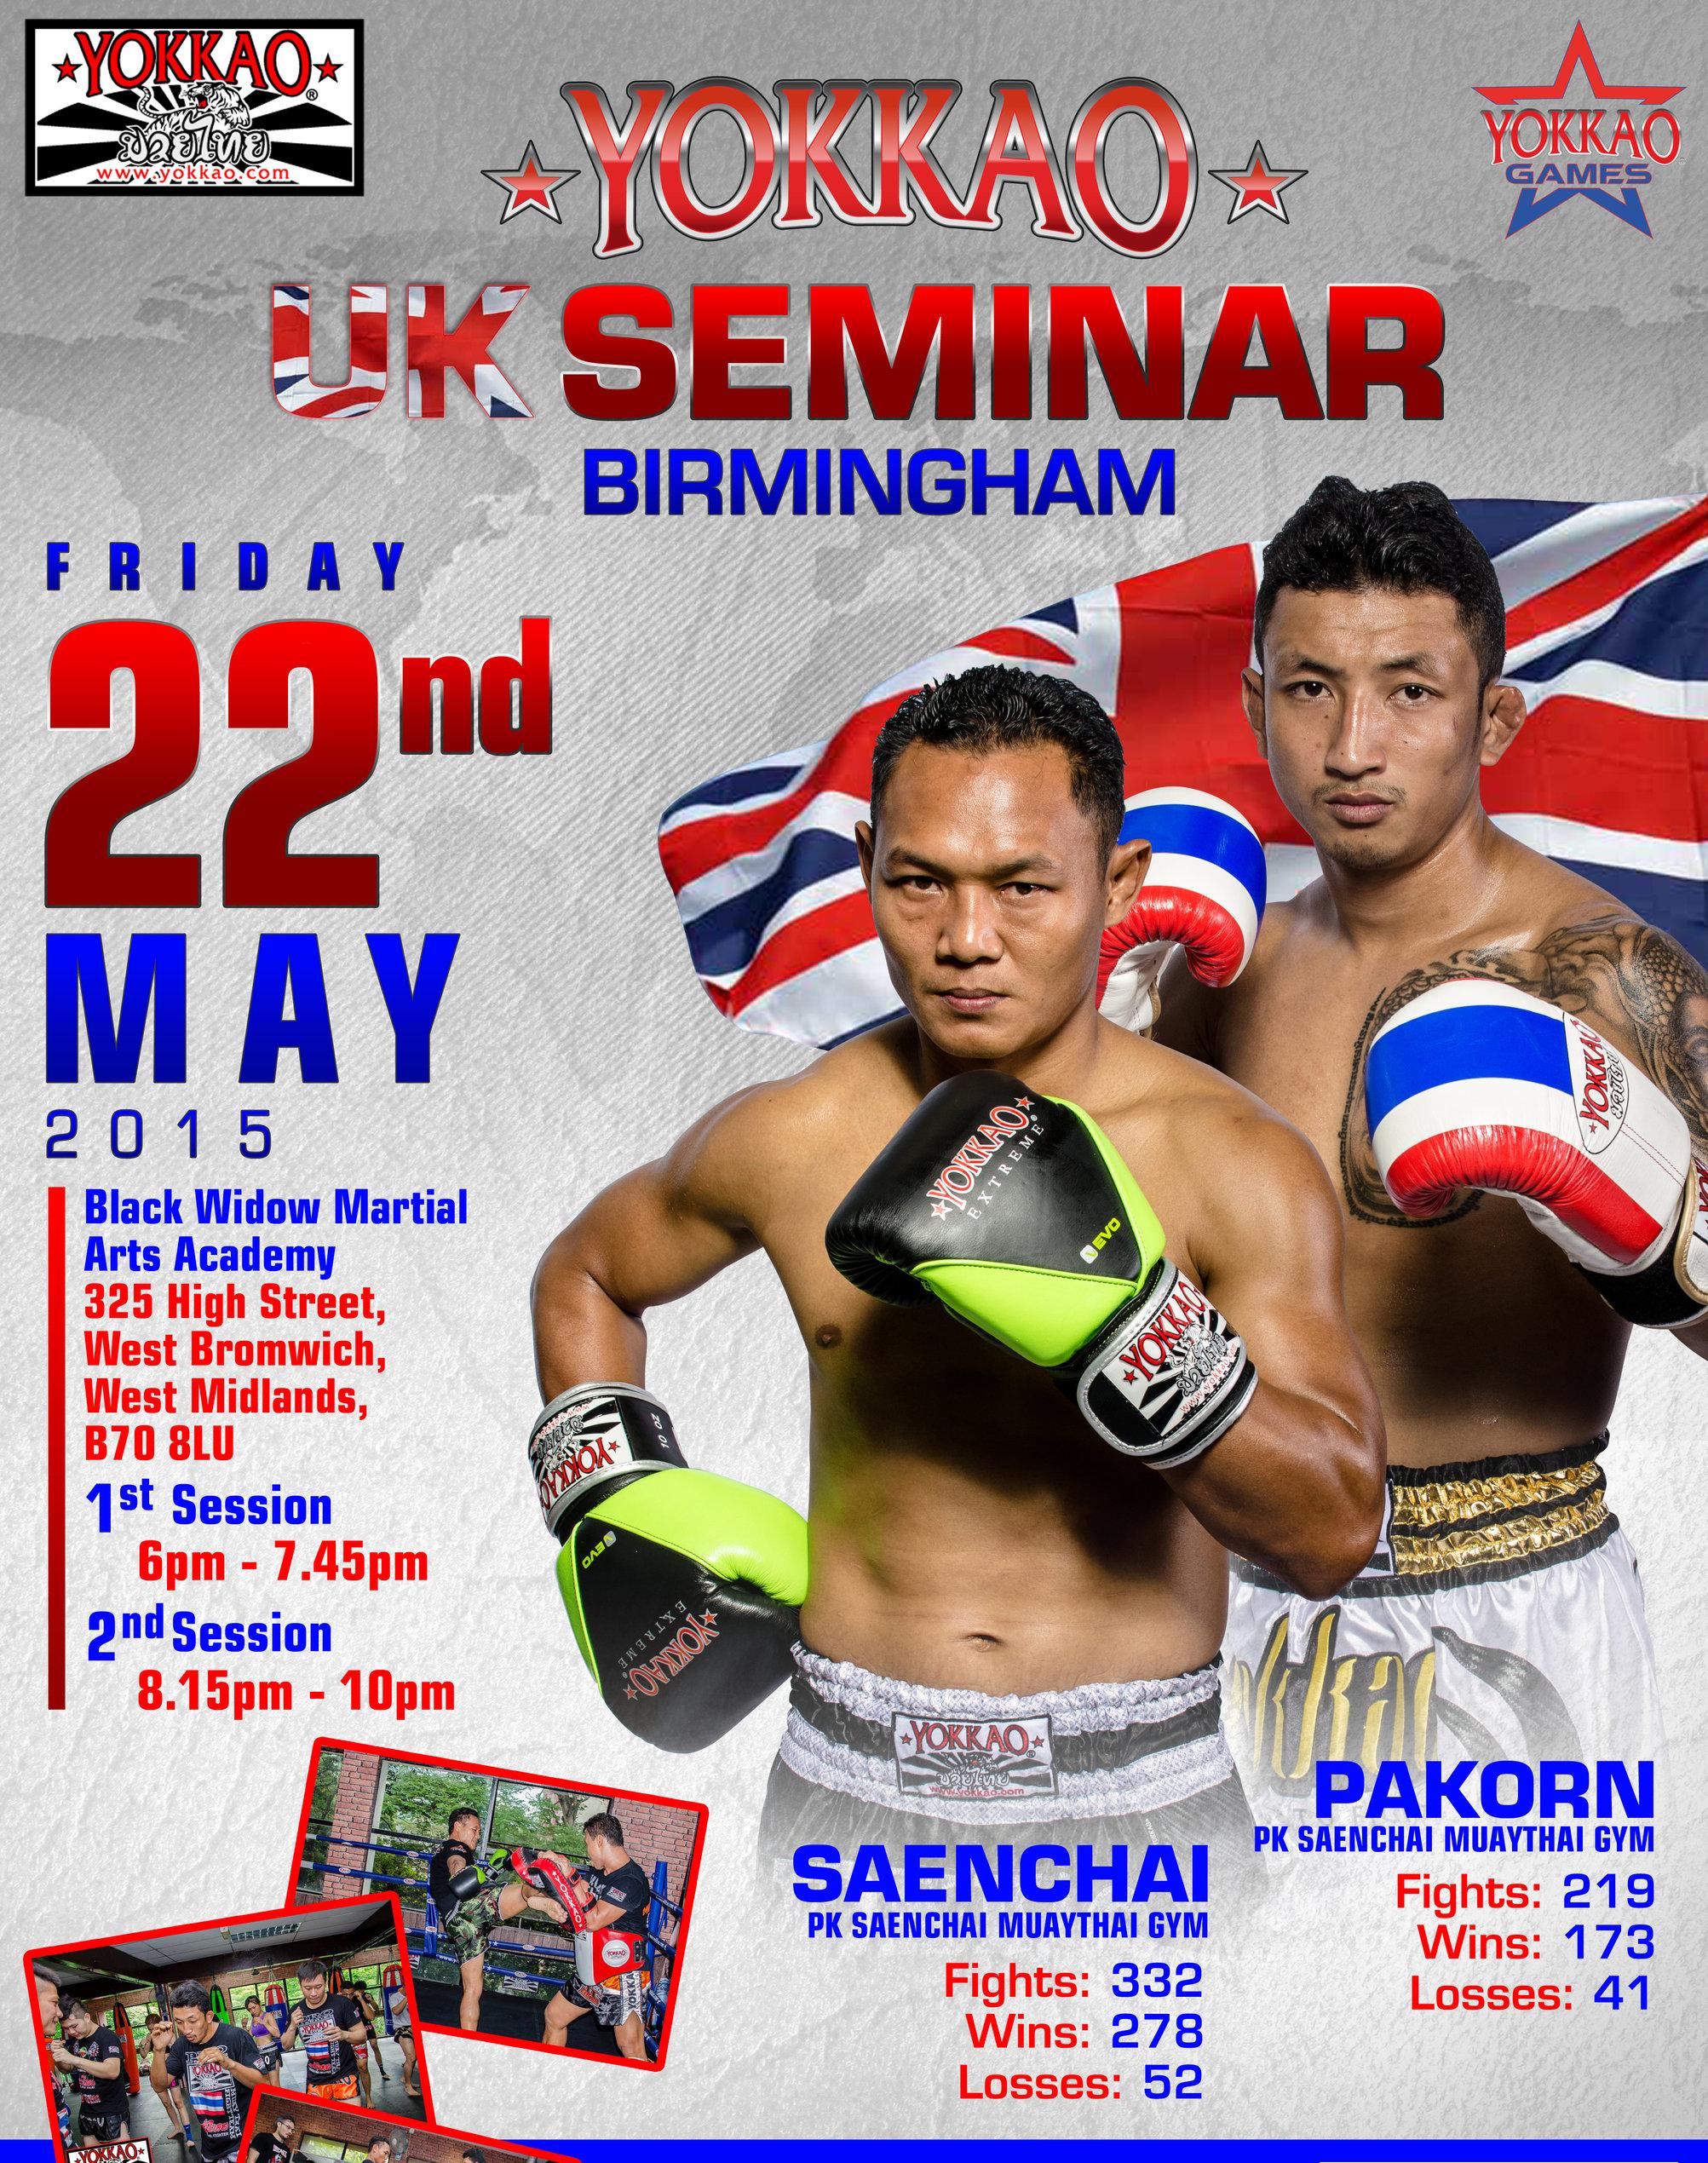 Black-widow-martial-arts-rsz_yokkao_seminar_birmingham